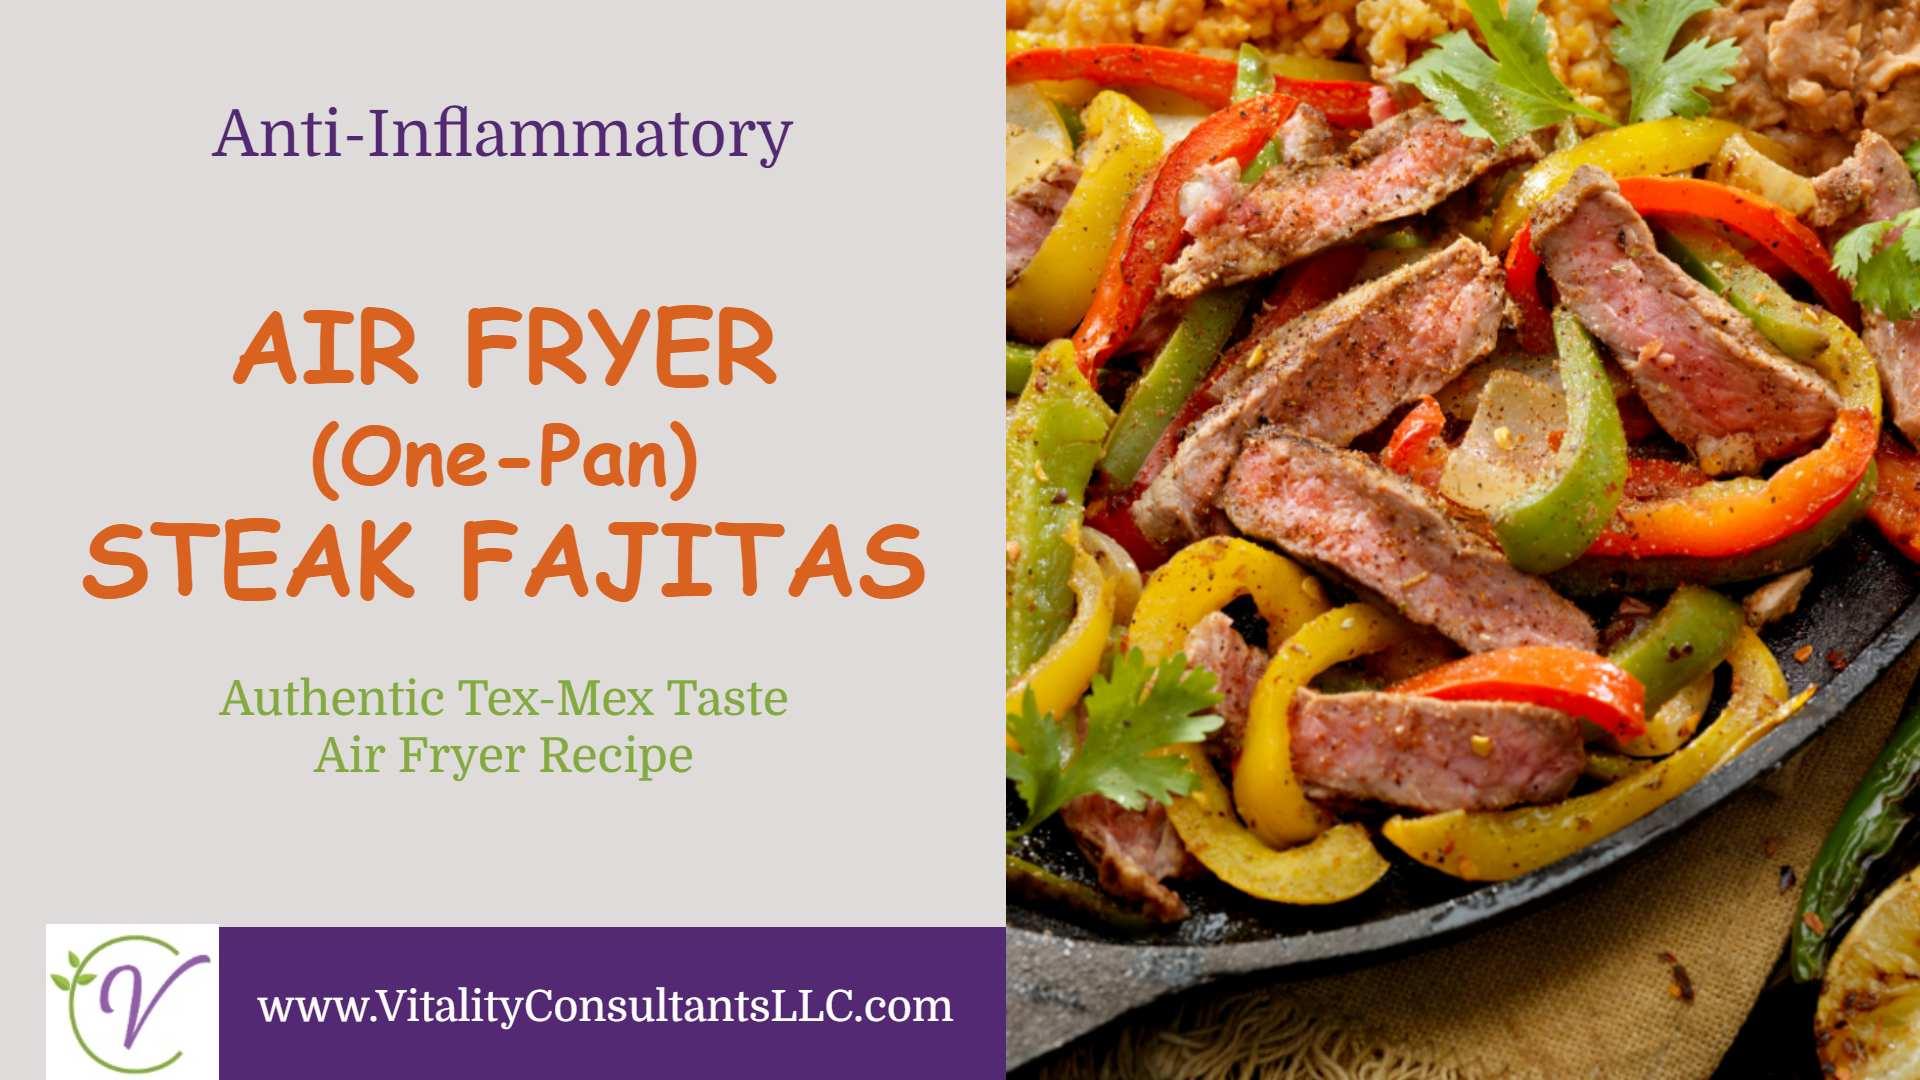 Air Fryer Steak Fajitas